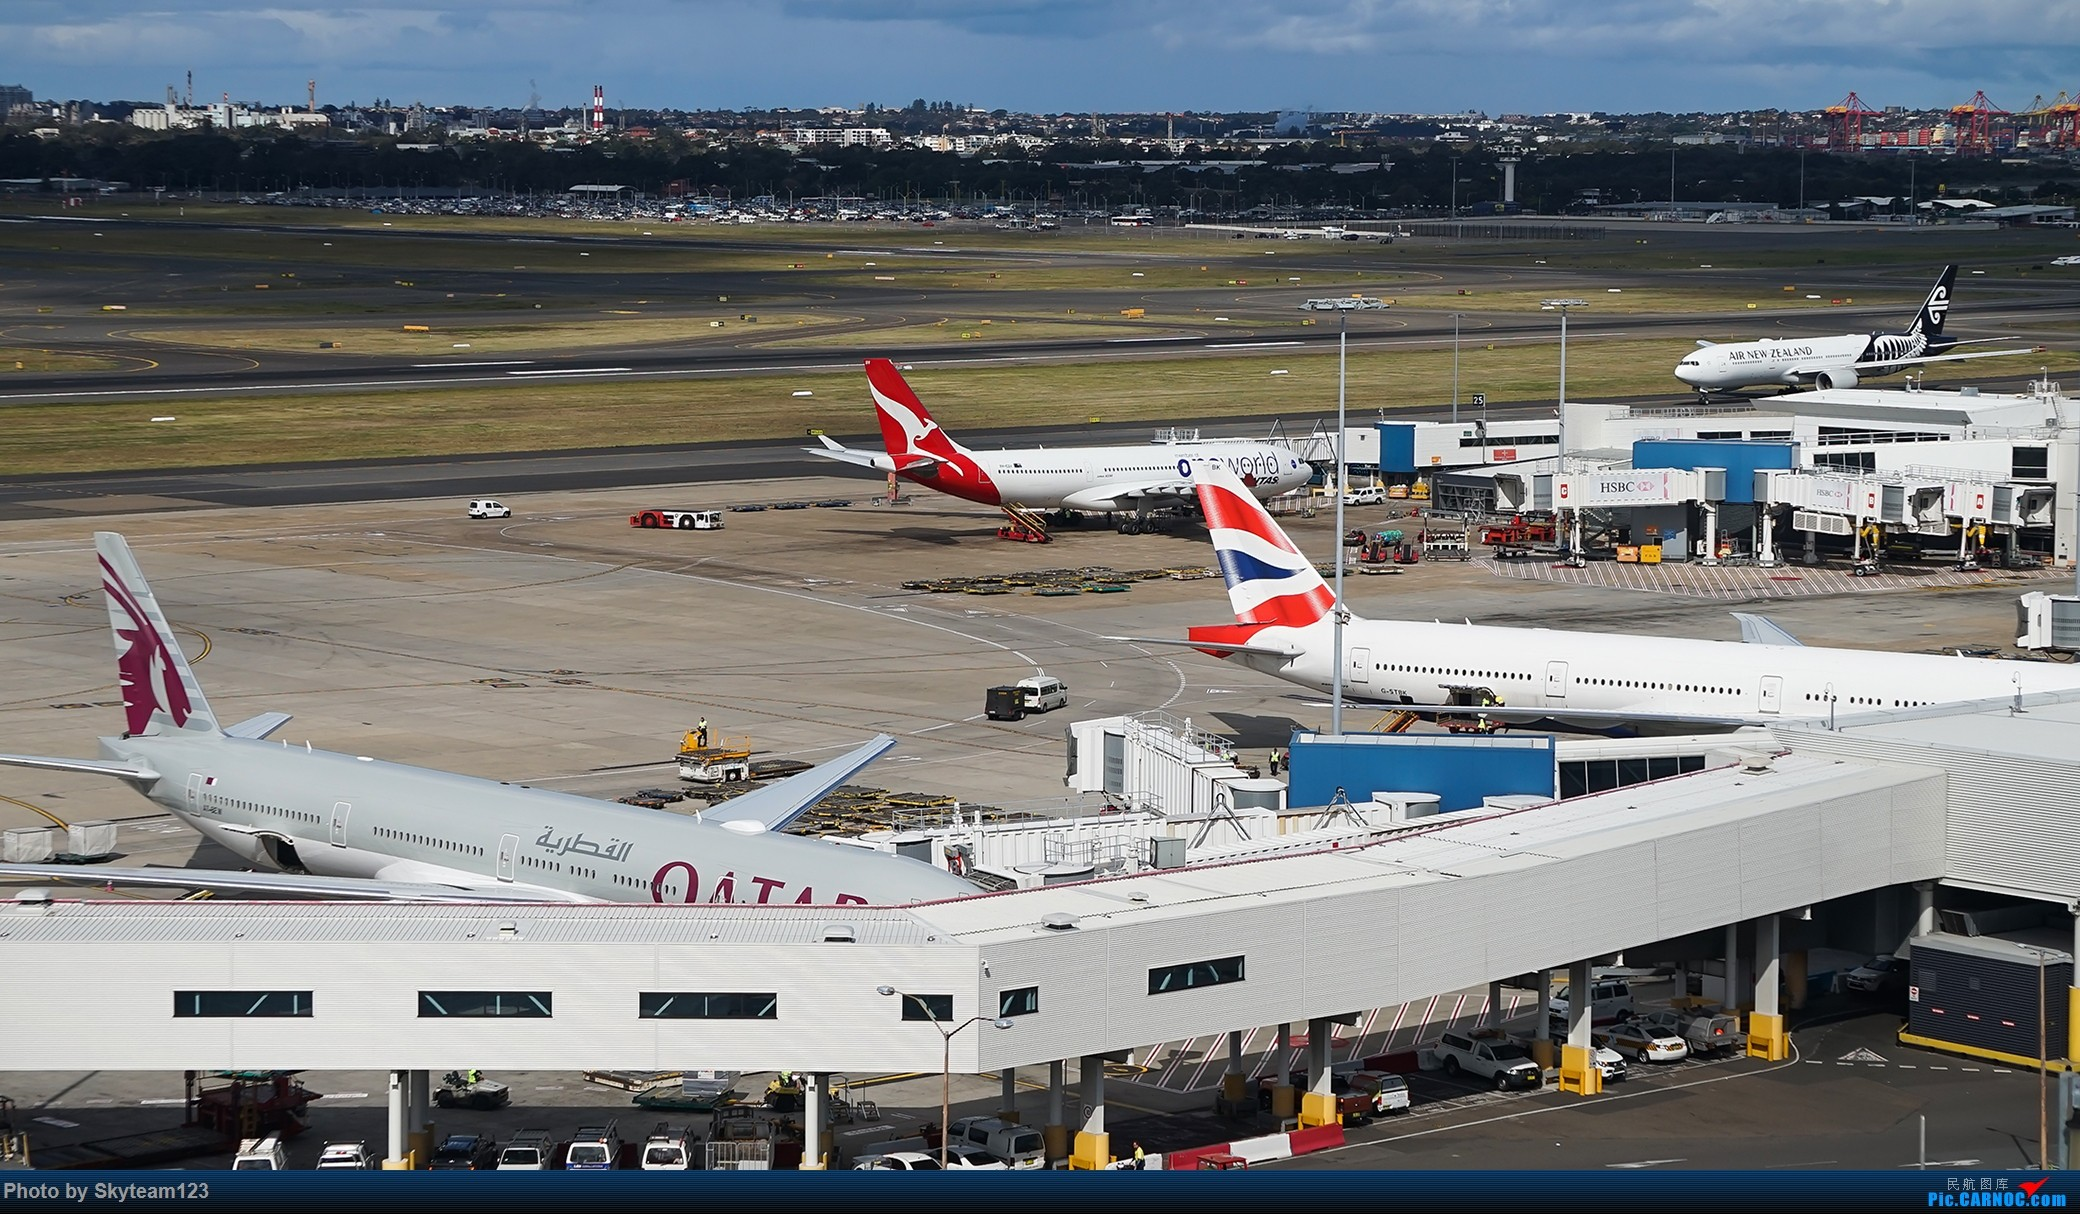 Re:[原创][SYD] 假期拍机小结 解锁16R跑道头拍机位 & 停车楼拍机作业 【全宽体】 BOEING 777-300ER B-KQR 澳大利亚悉尼金斯福德·史密斯机场 澳大利亚悉尼金斯福德·史密斯机场